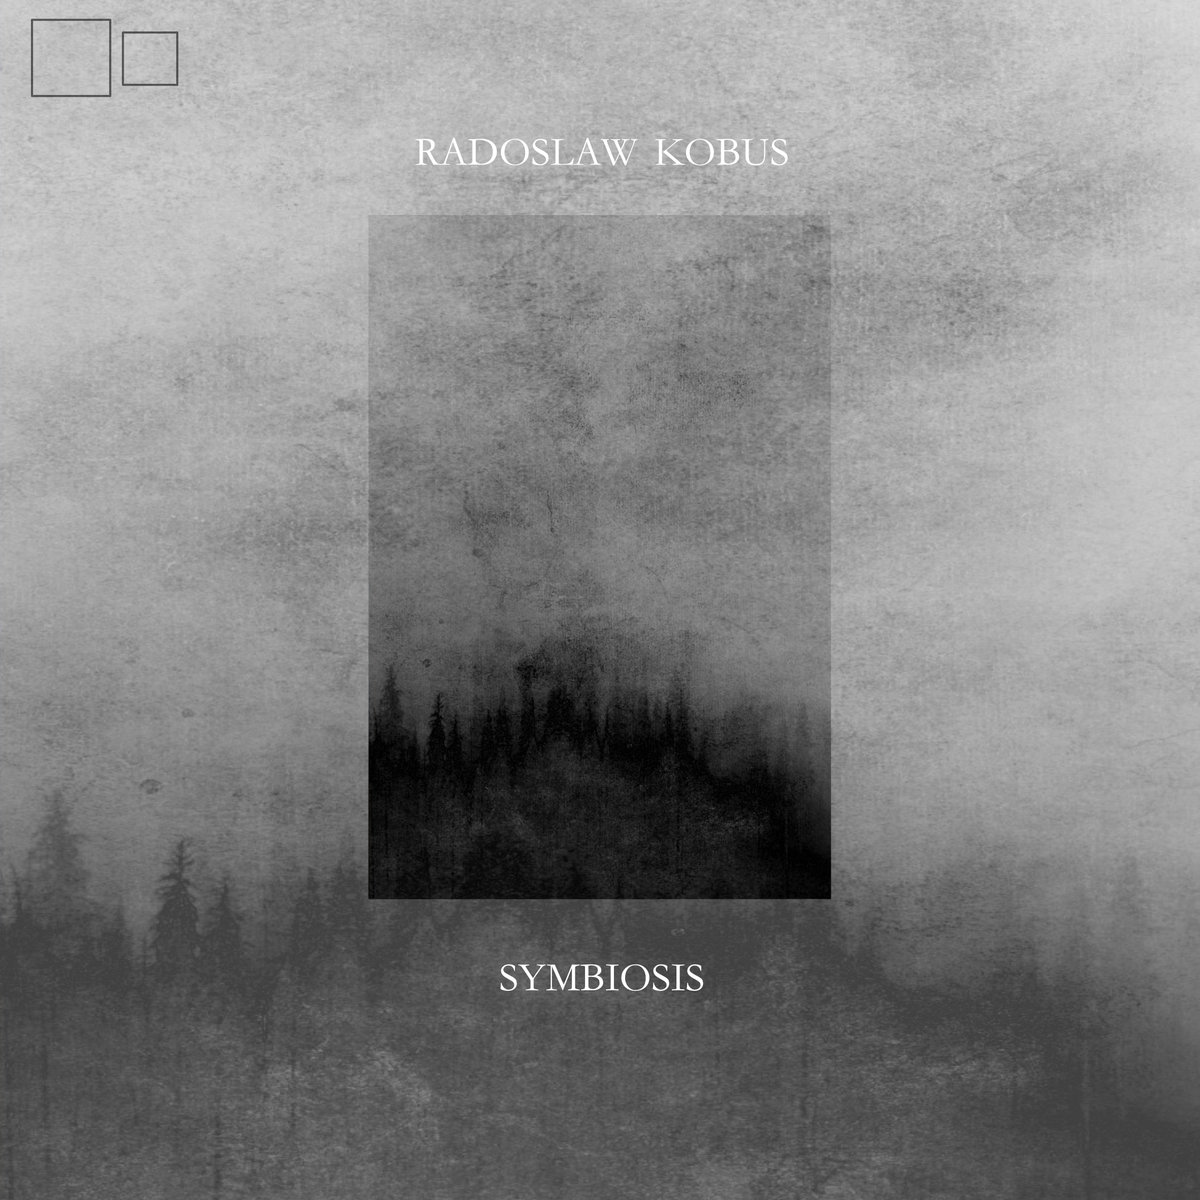 Radoslaw Kobus – Symbiosis